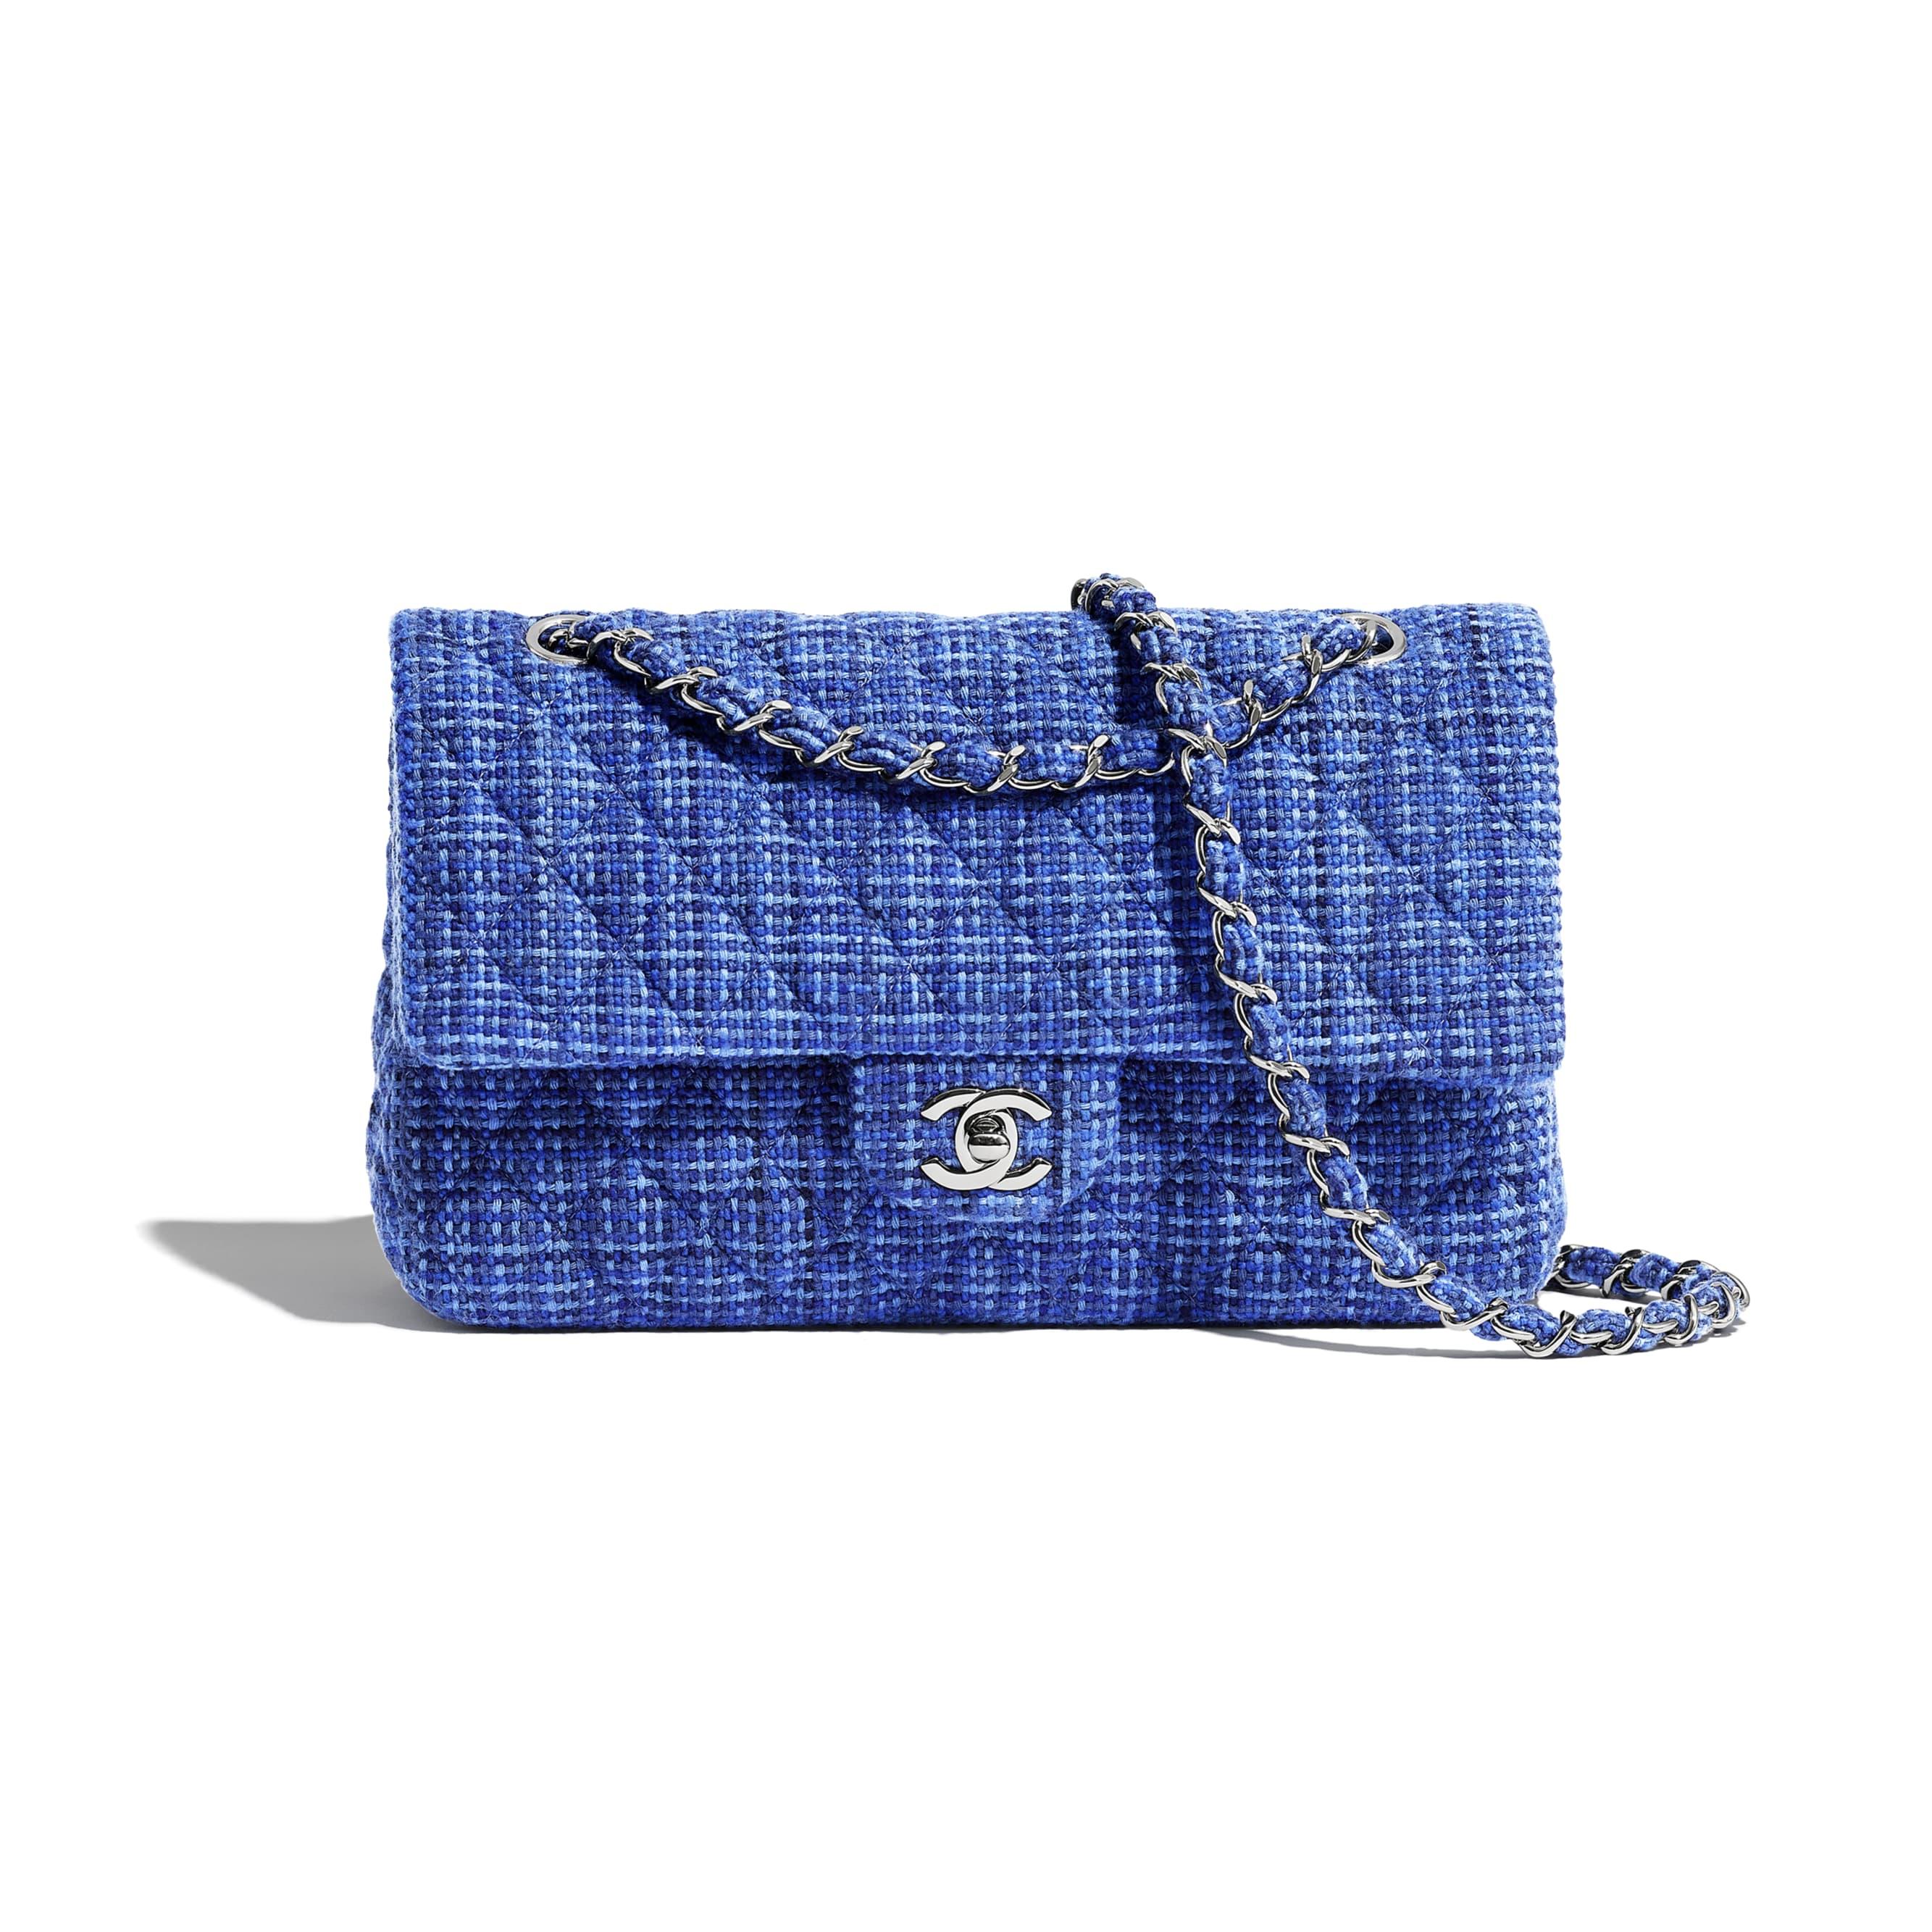 Classic Handbag - Navy Blue & Blue - Tweed & Silver-Tone Metal - CHANEL - Default view - see standard sized version